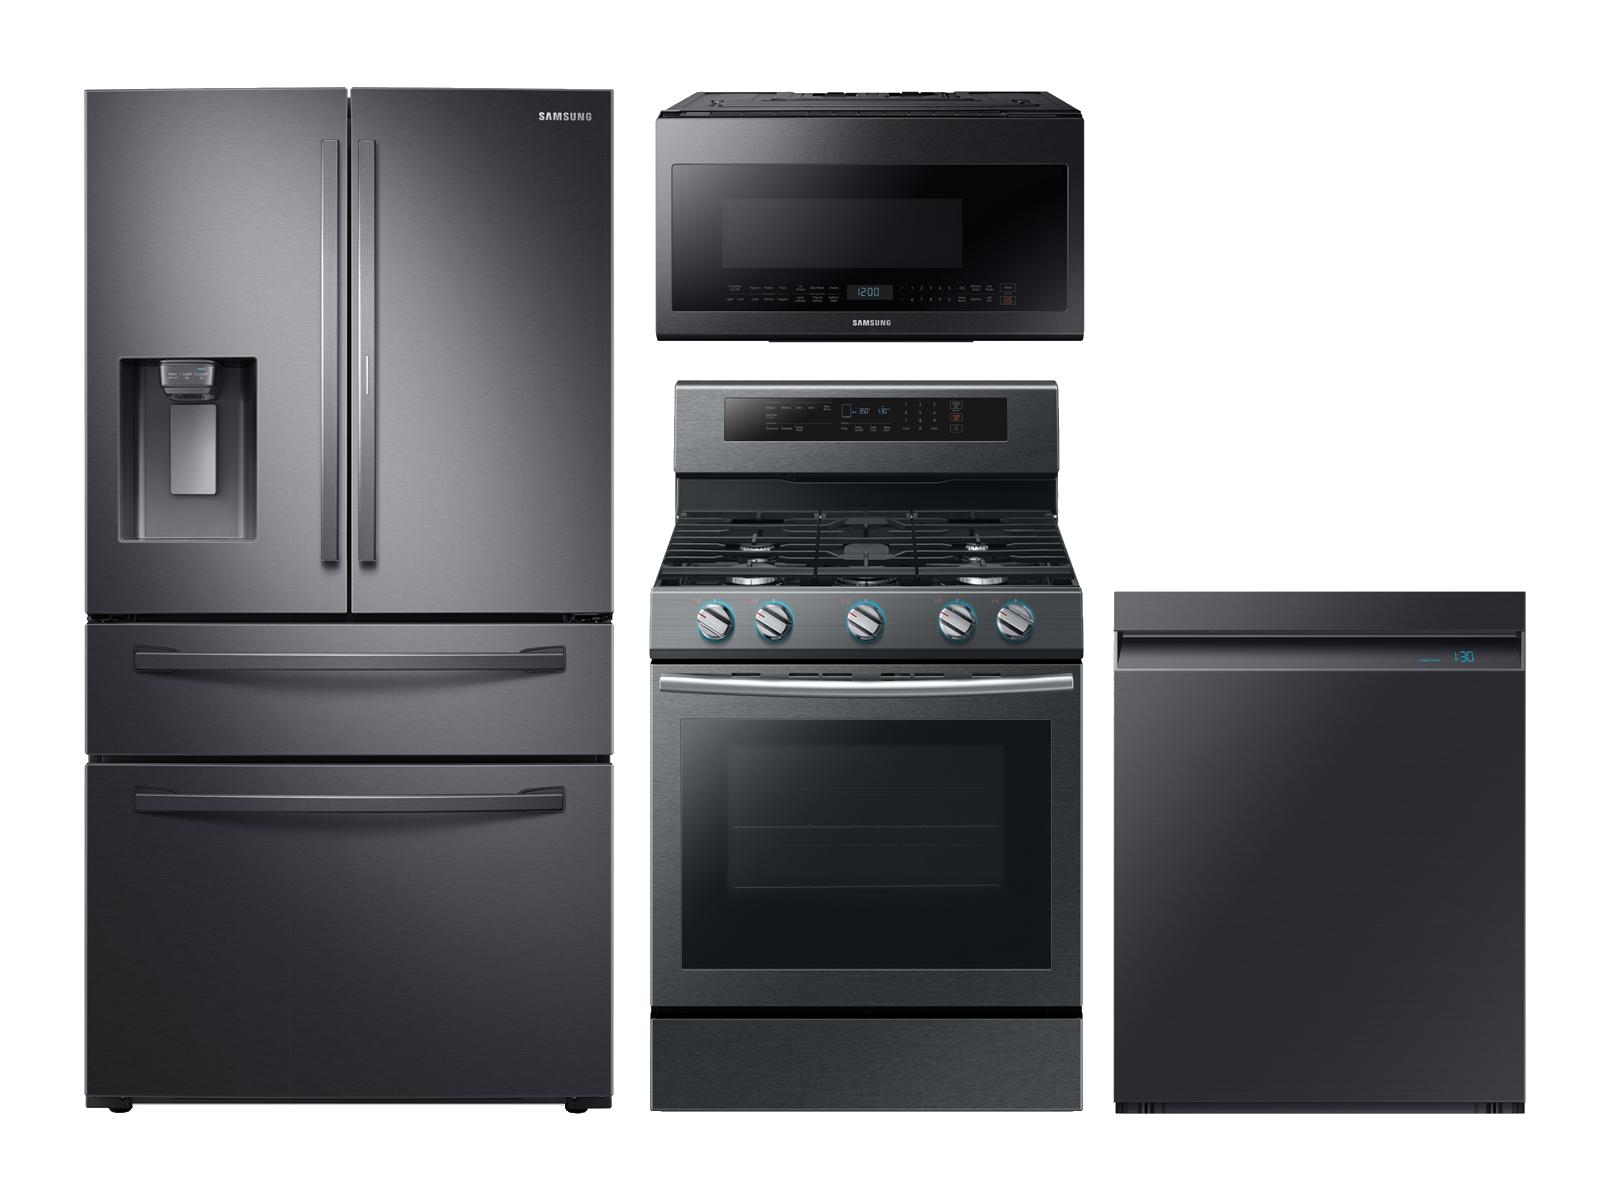 Samsung 4-door Refrigerator + Gas Range + Linear Wash Dishwasher + Microwave Kitchen Package in Black Stainless